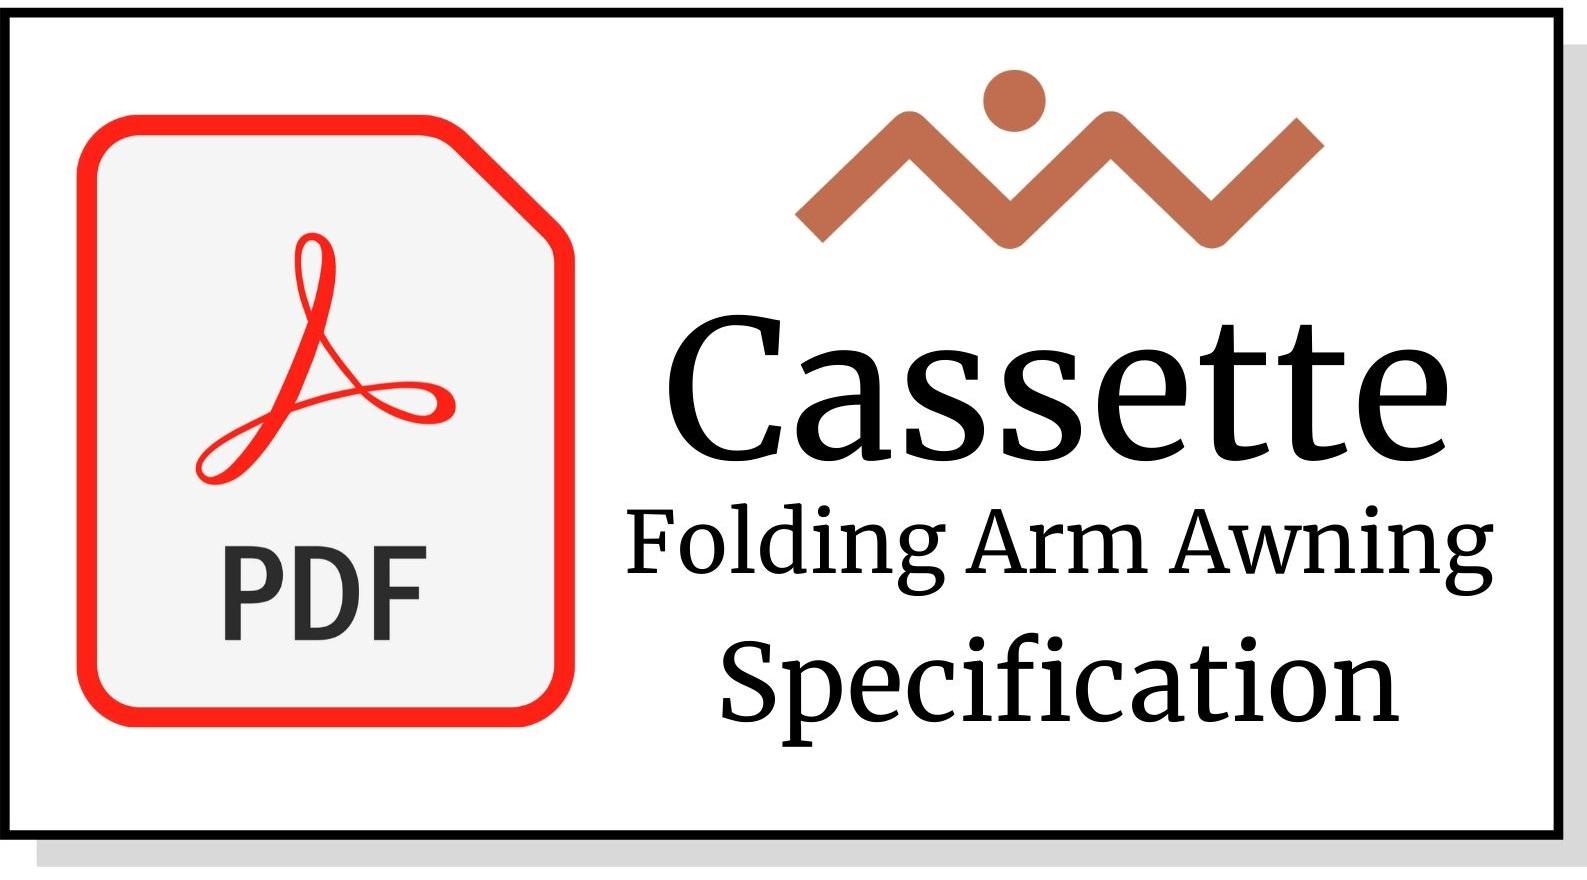 Cassette Folding Arm Awning